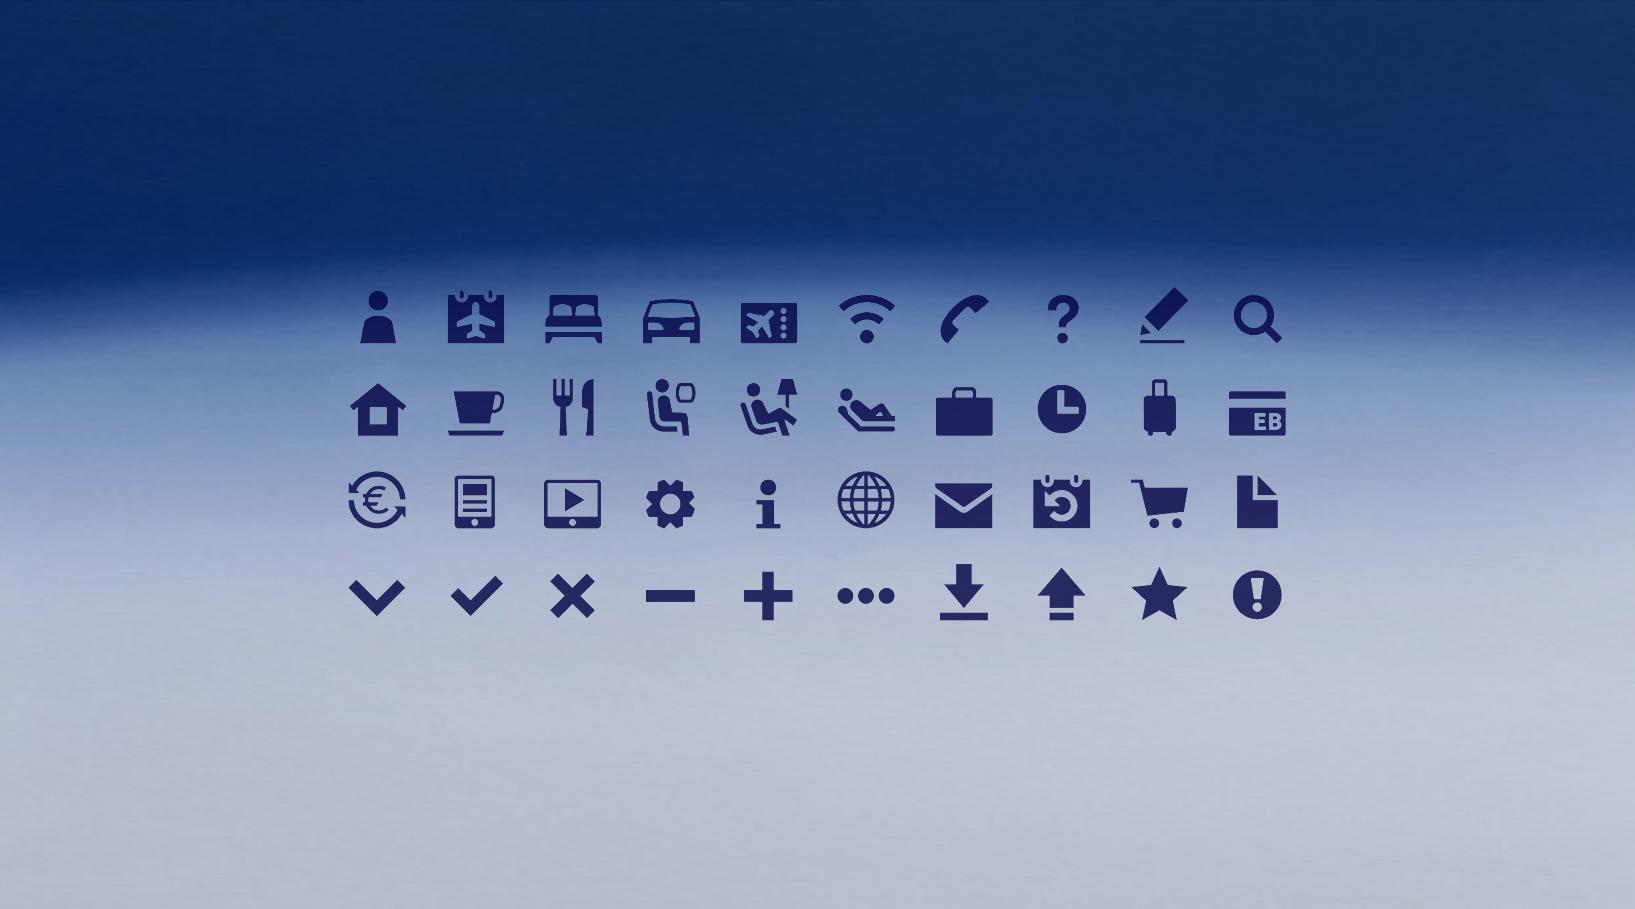 icons-sas.jpg